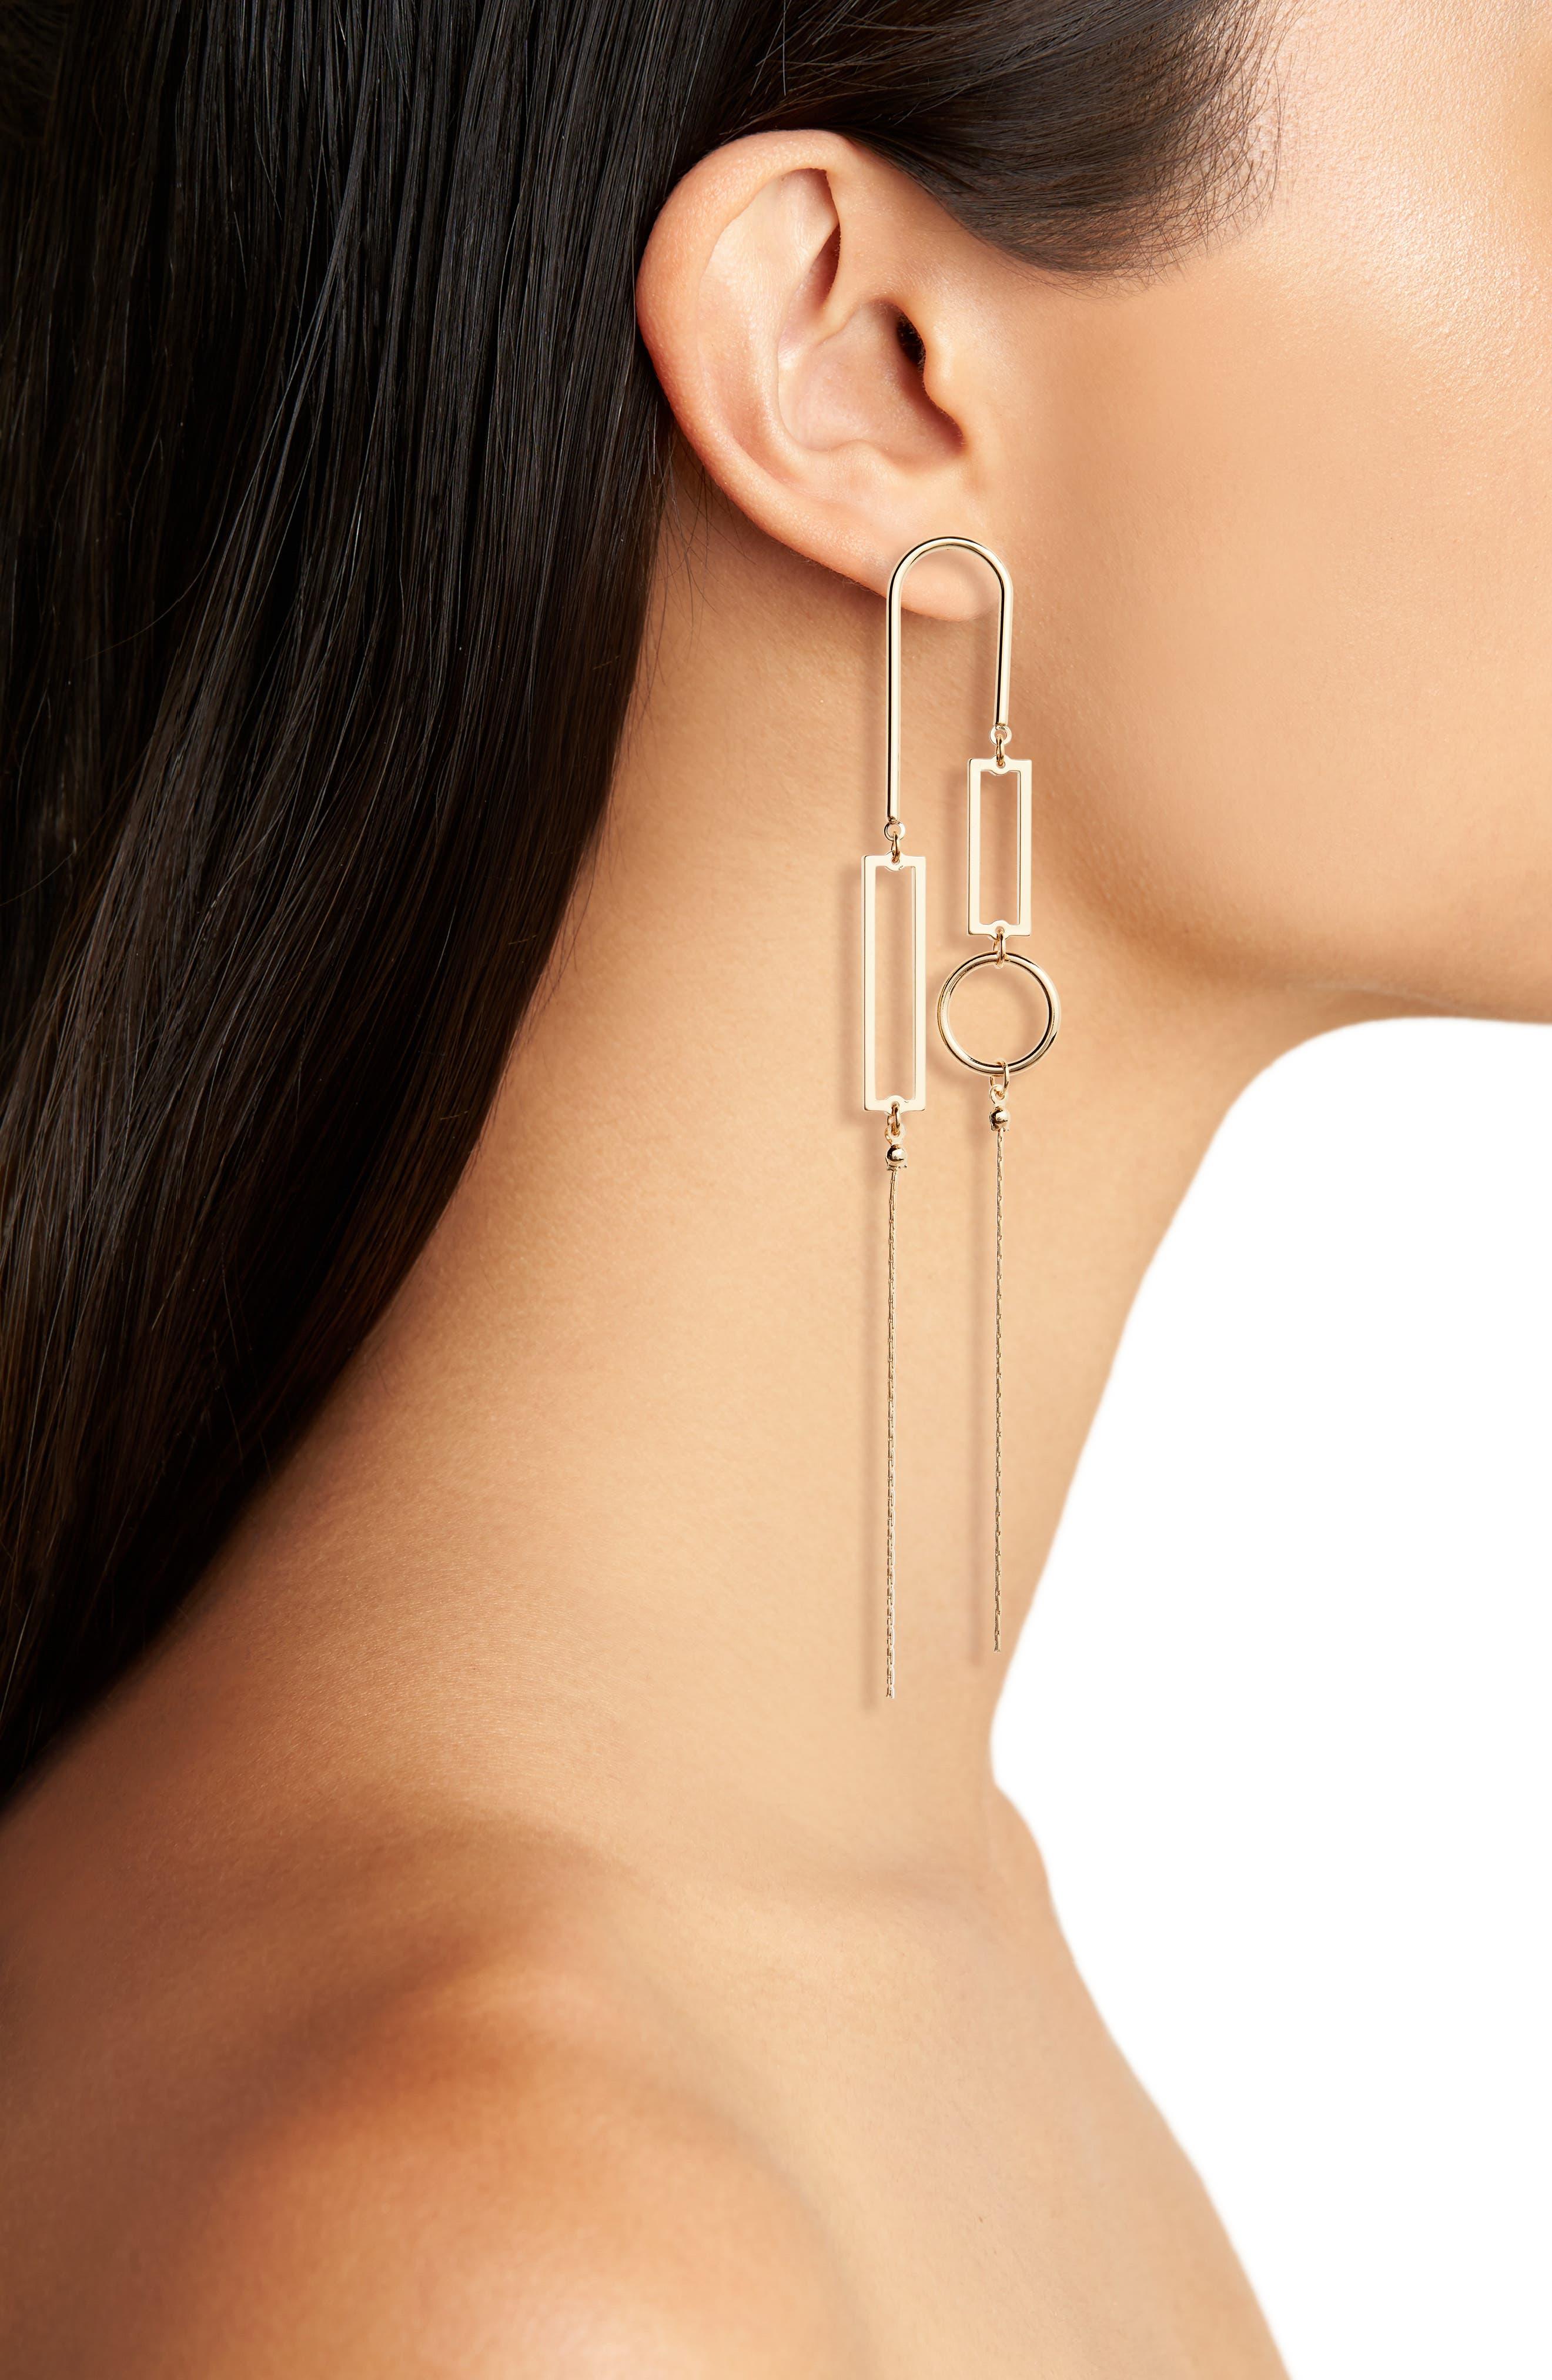 Geometric Mobile Earrings,                             Alternate thumbnail 2, color,                             710